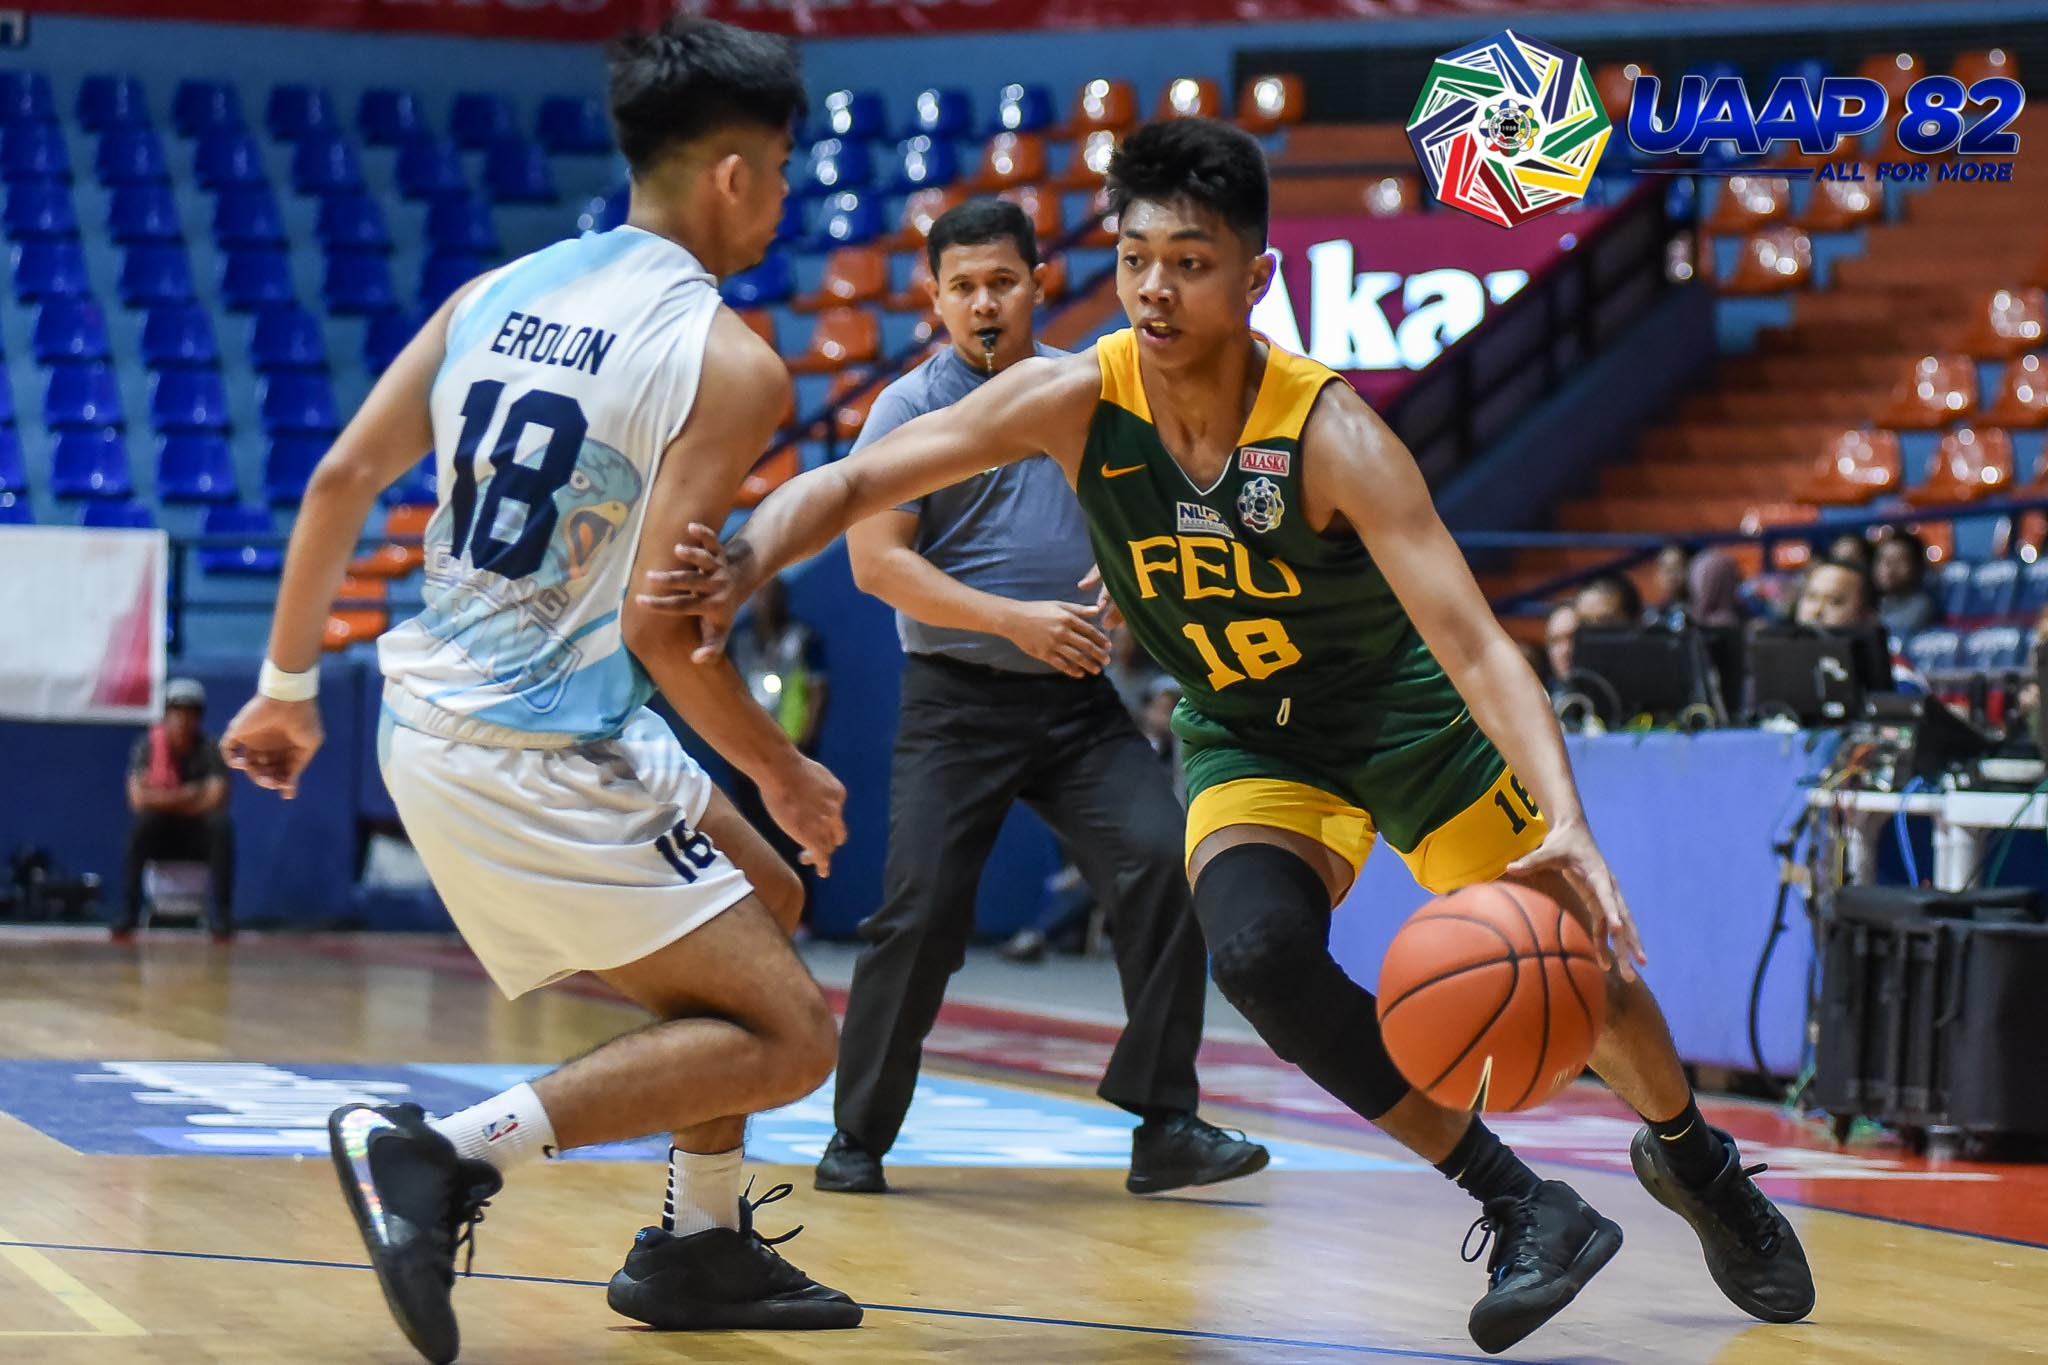 UAAP-Jrs-FEU-vs.-ADU-Bautista-9714 Estacio says leaving FEU was not easy as good pals remain there Basketball DLSU FEU News UAAP  - philippine sports news